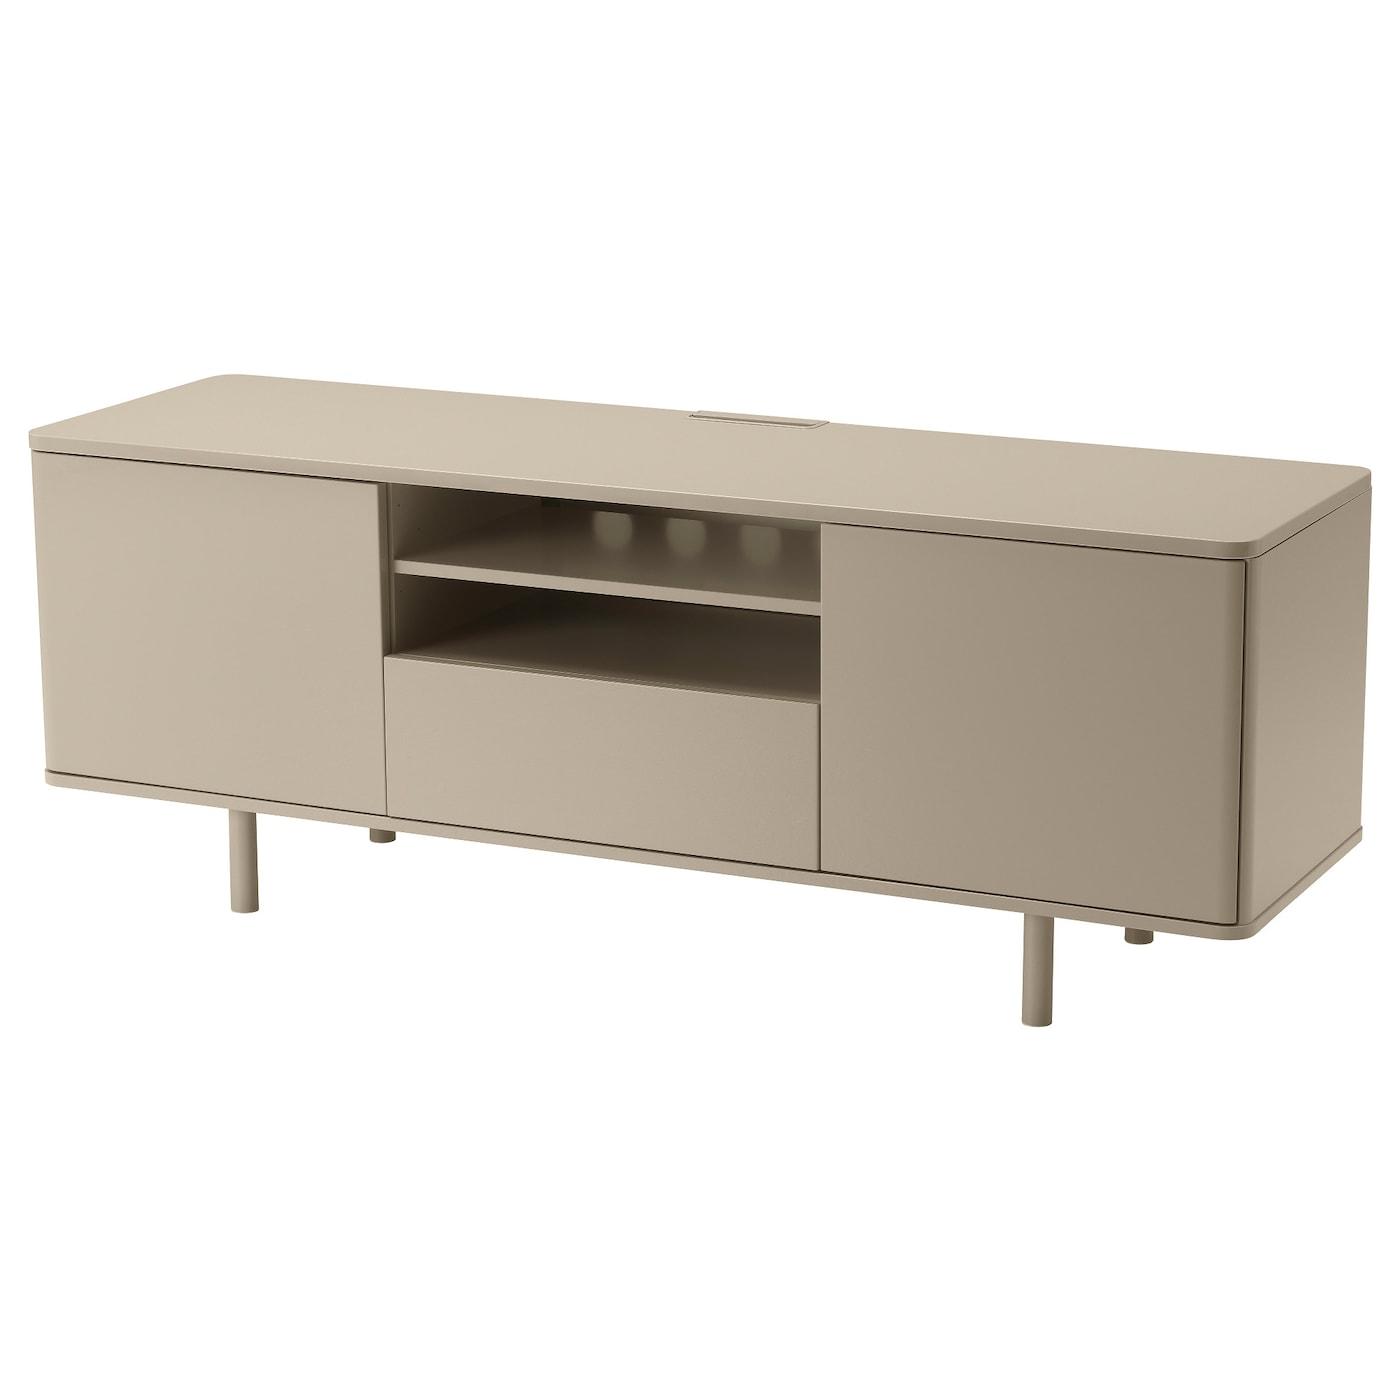 Mostorp mueble tv alto brillo beige 160 x 47 x 60 cm ikea for Mueble tv ikea